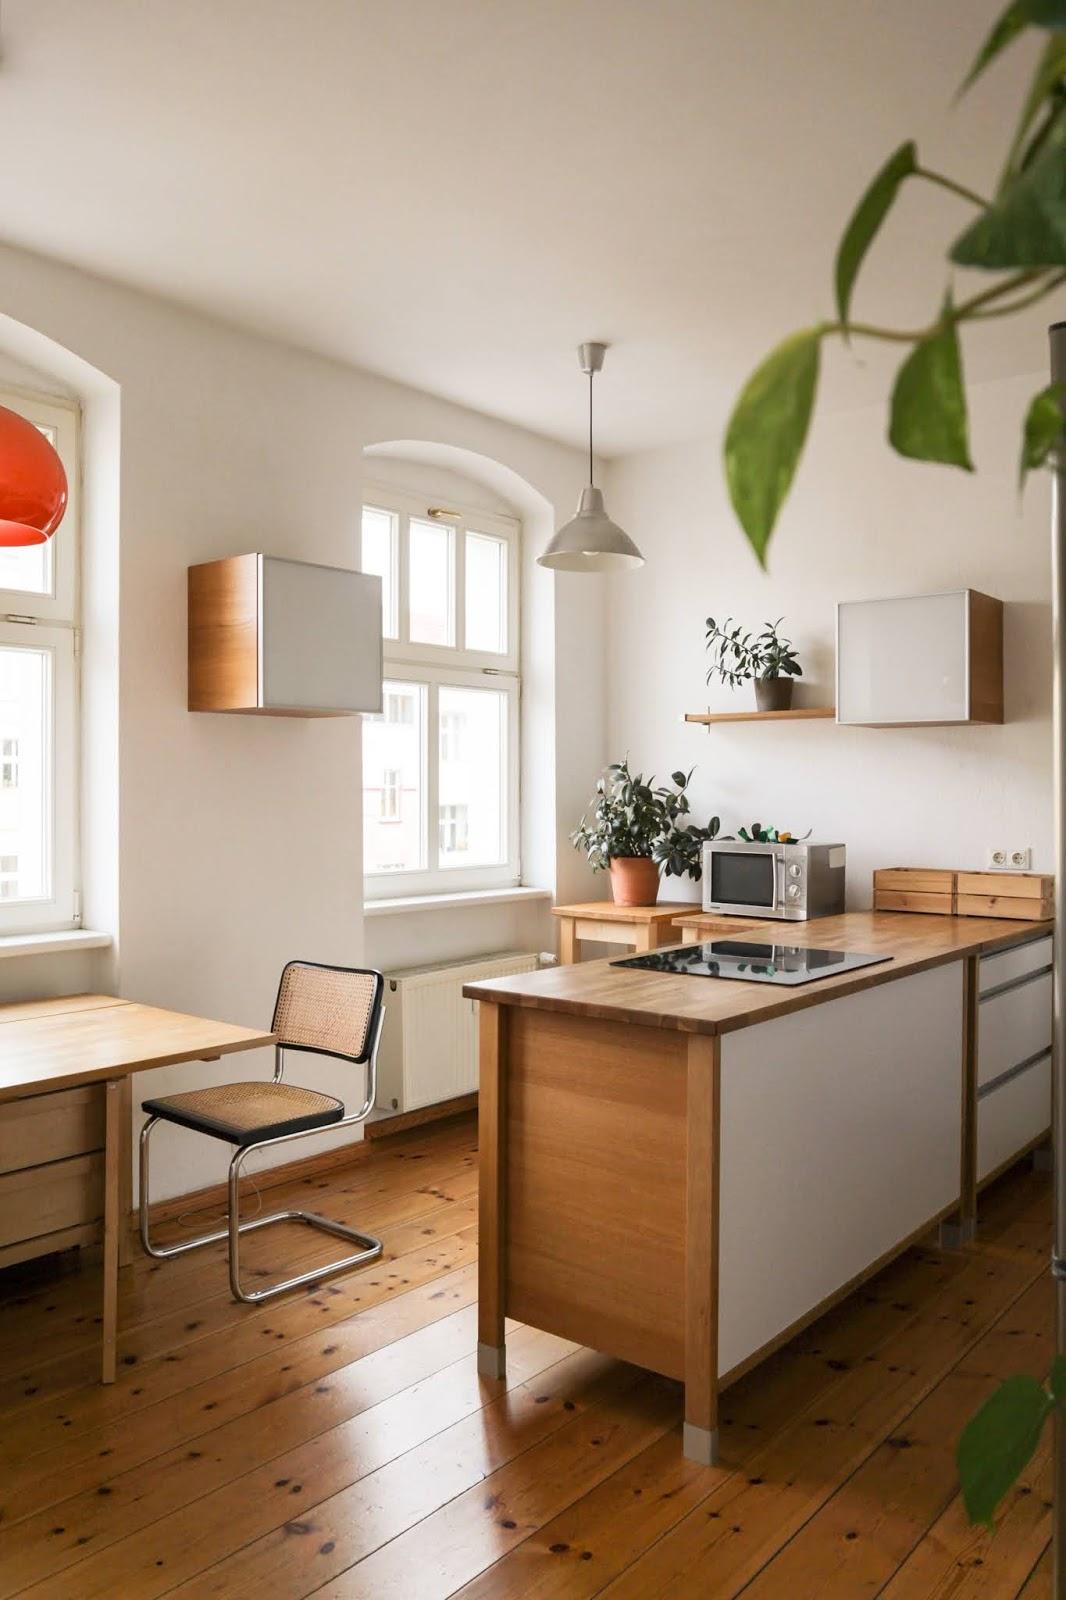 idealny styl do mieszkania